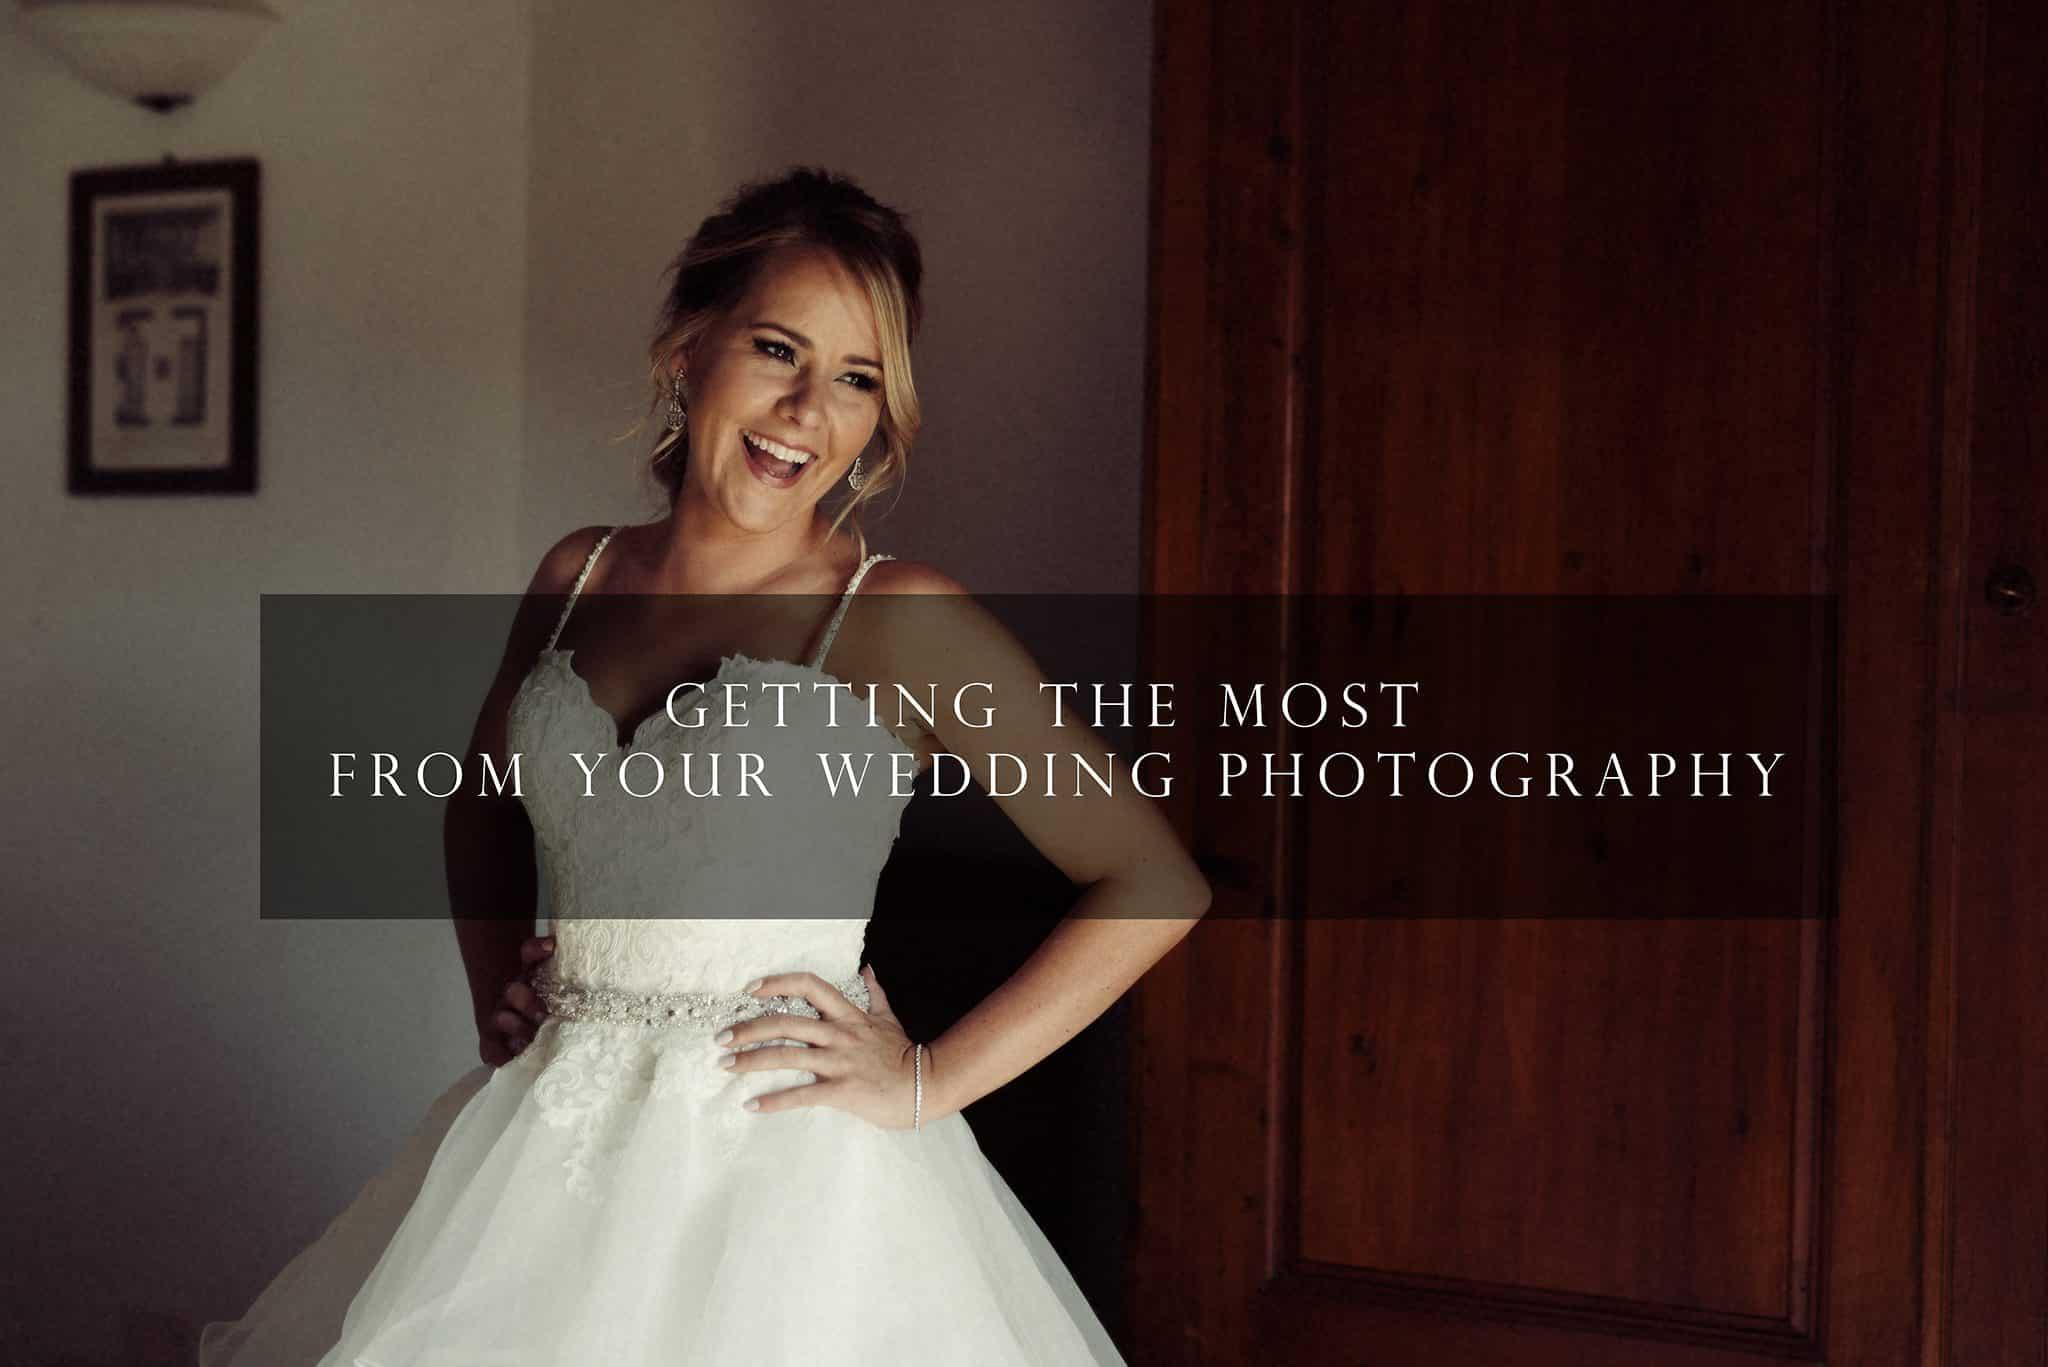 wedding photographer milton keynes; destination wedding photographer; wedding photographer Aylesbury; wedding photographer Leighton Buzzard